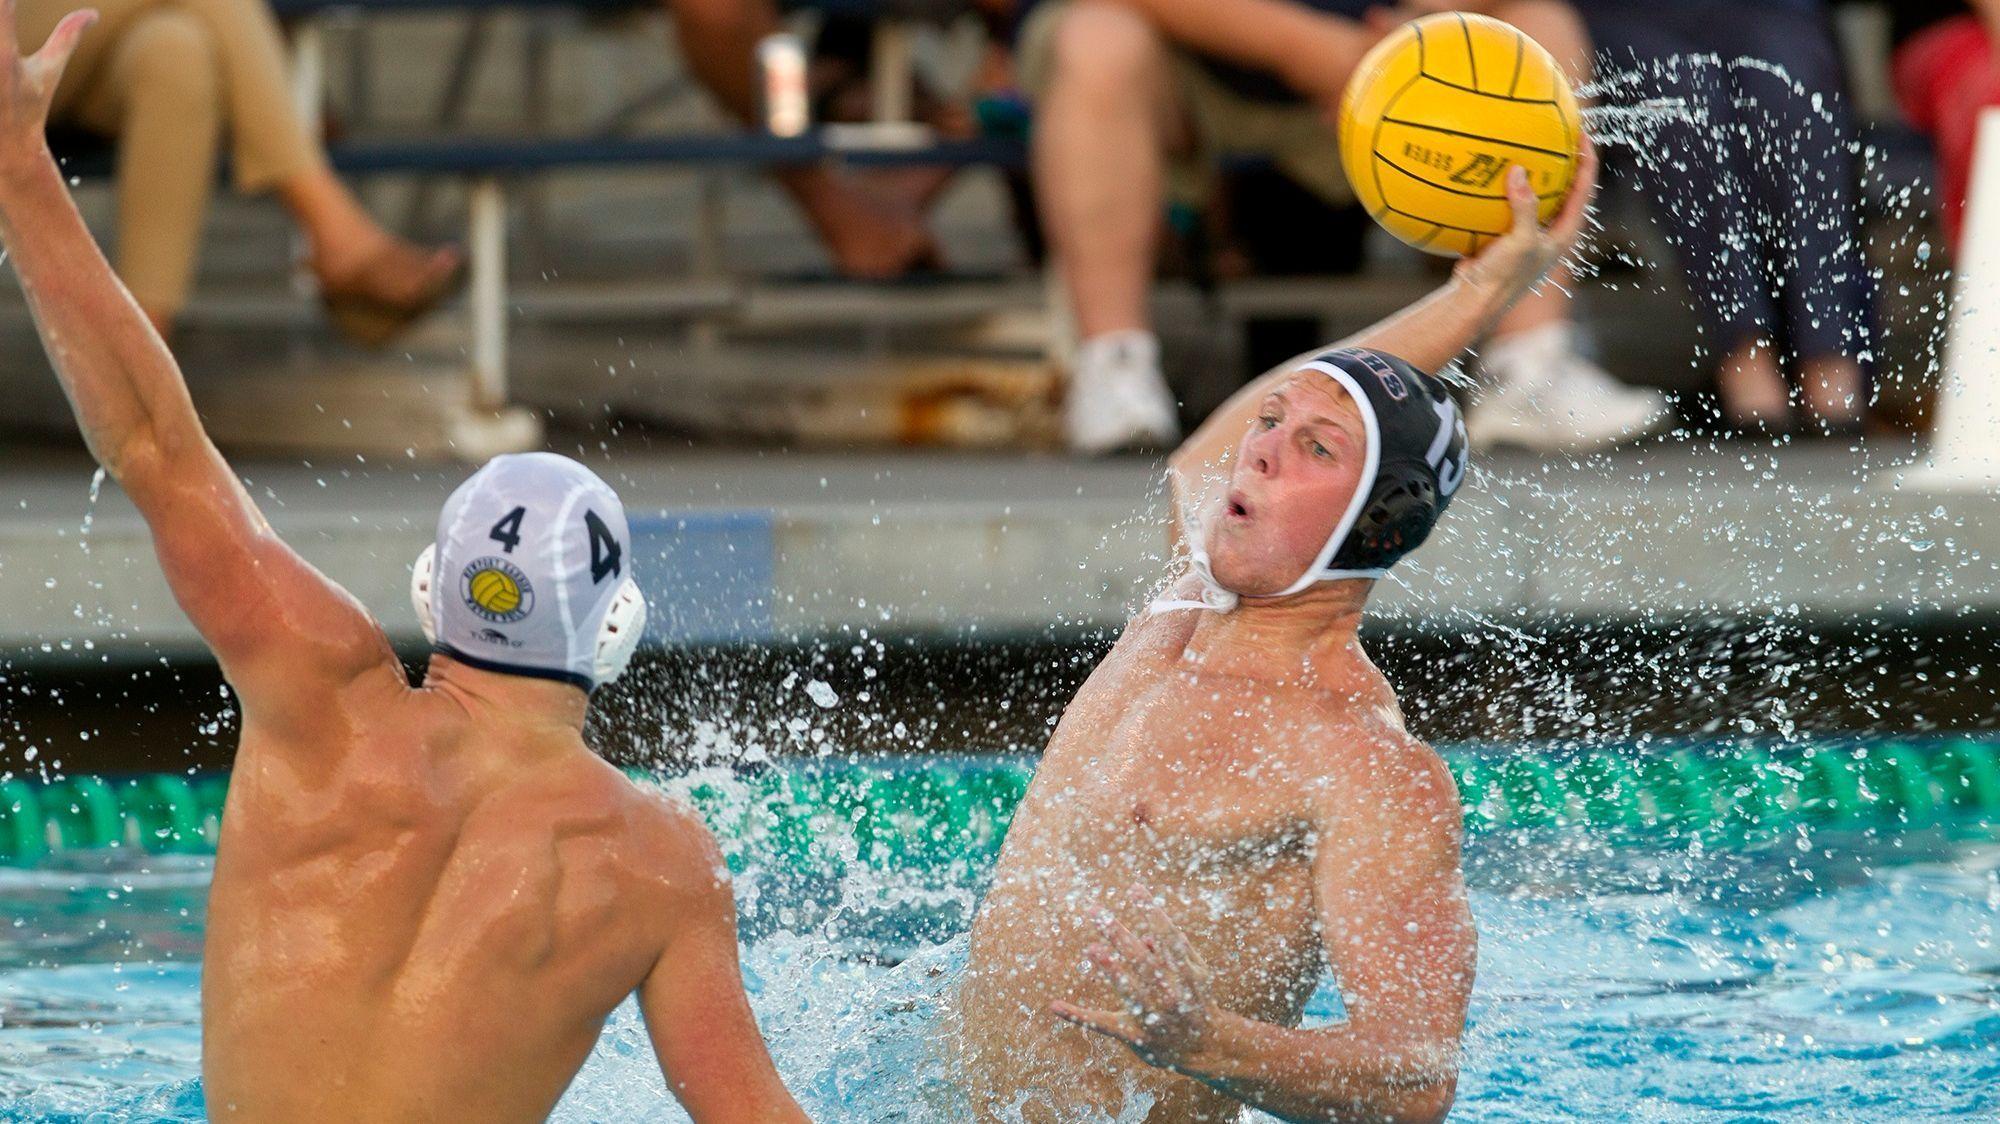 Huntington Beach boys' water polo player Jacob Cavano